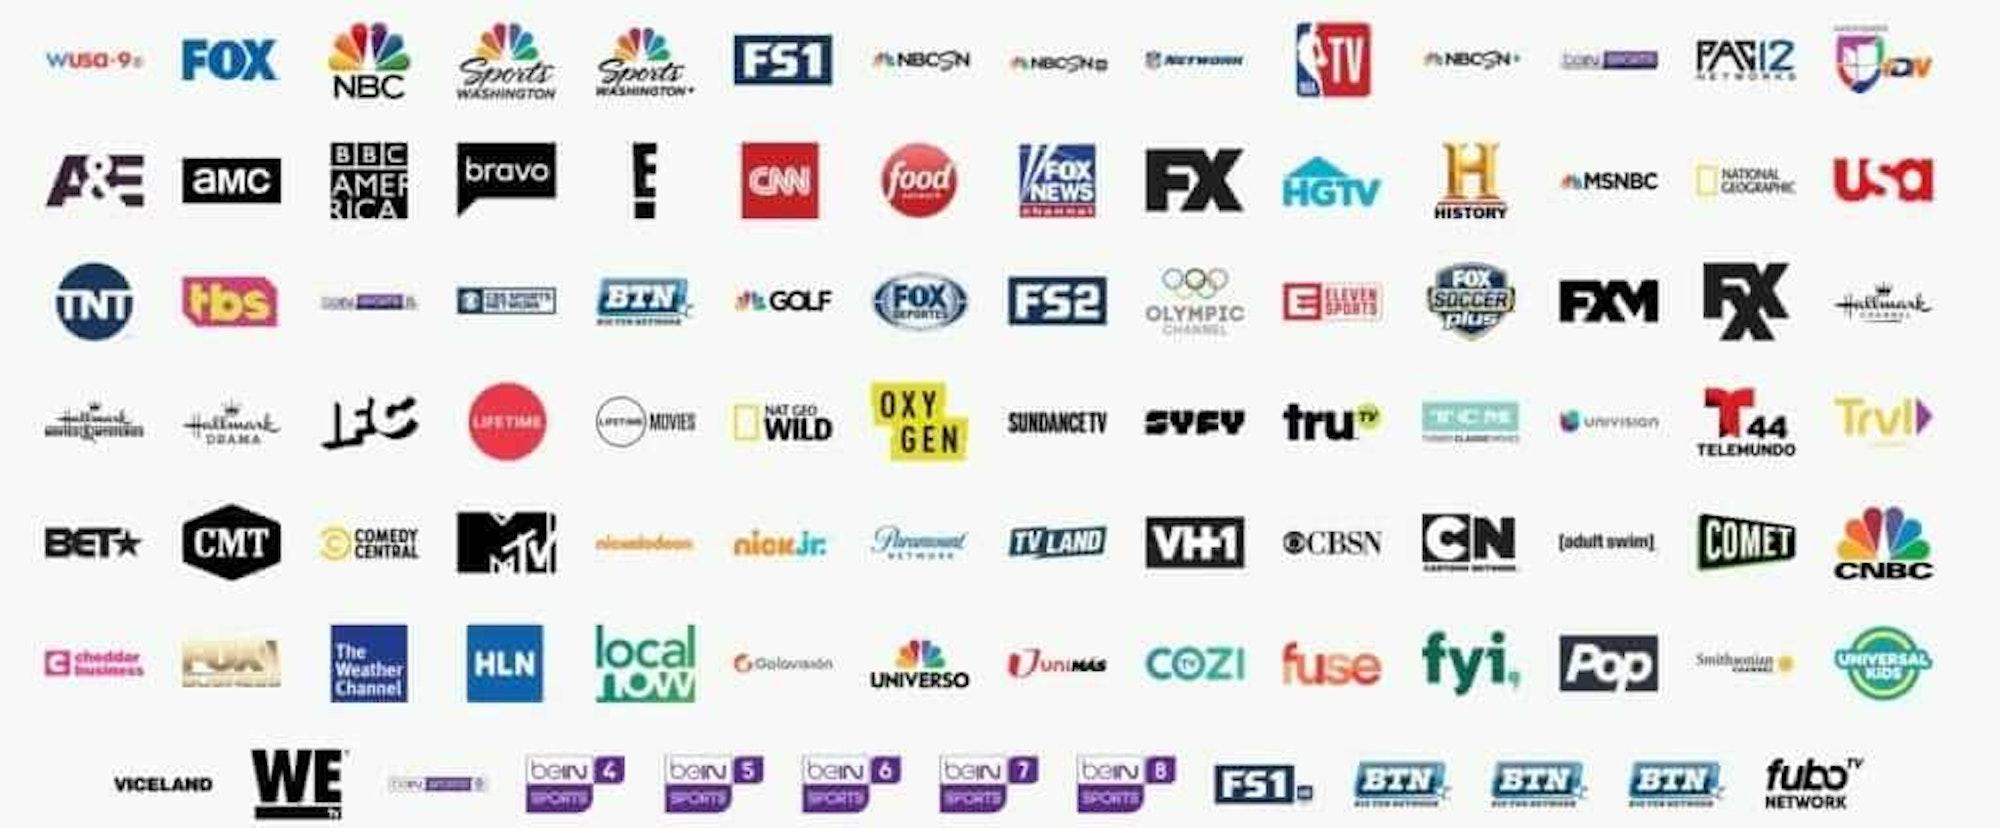 bills bengals fubo tv nfl cbs afc streaming